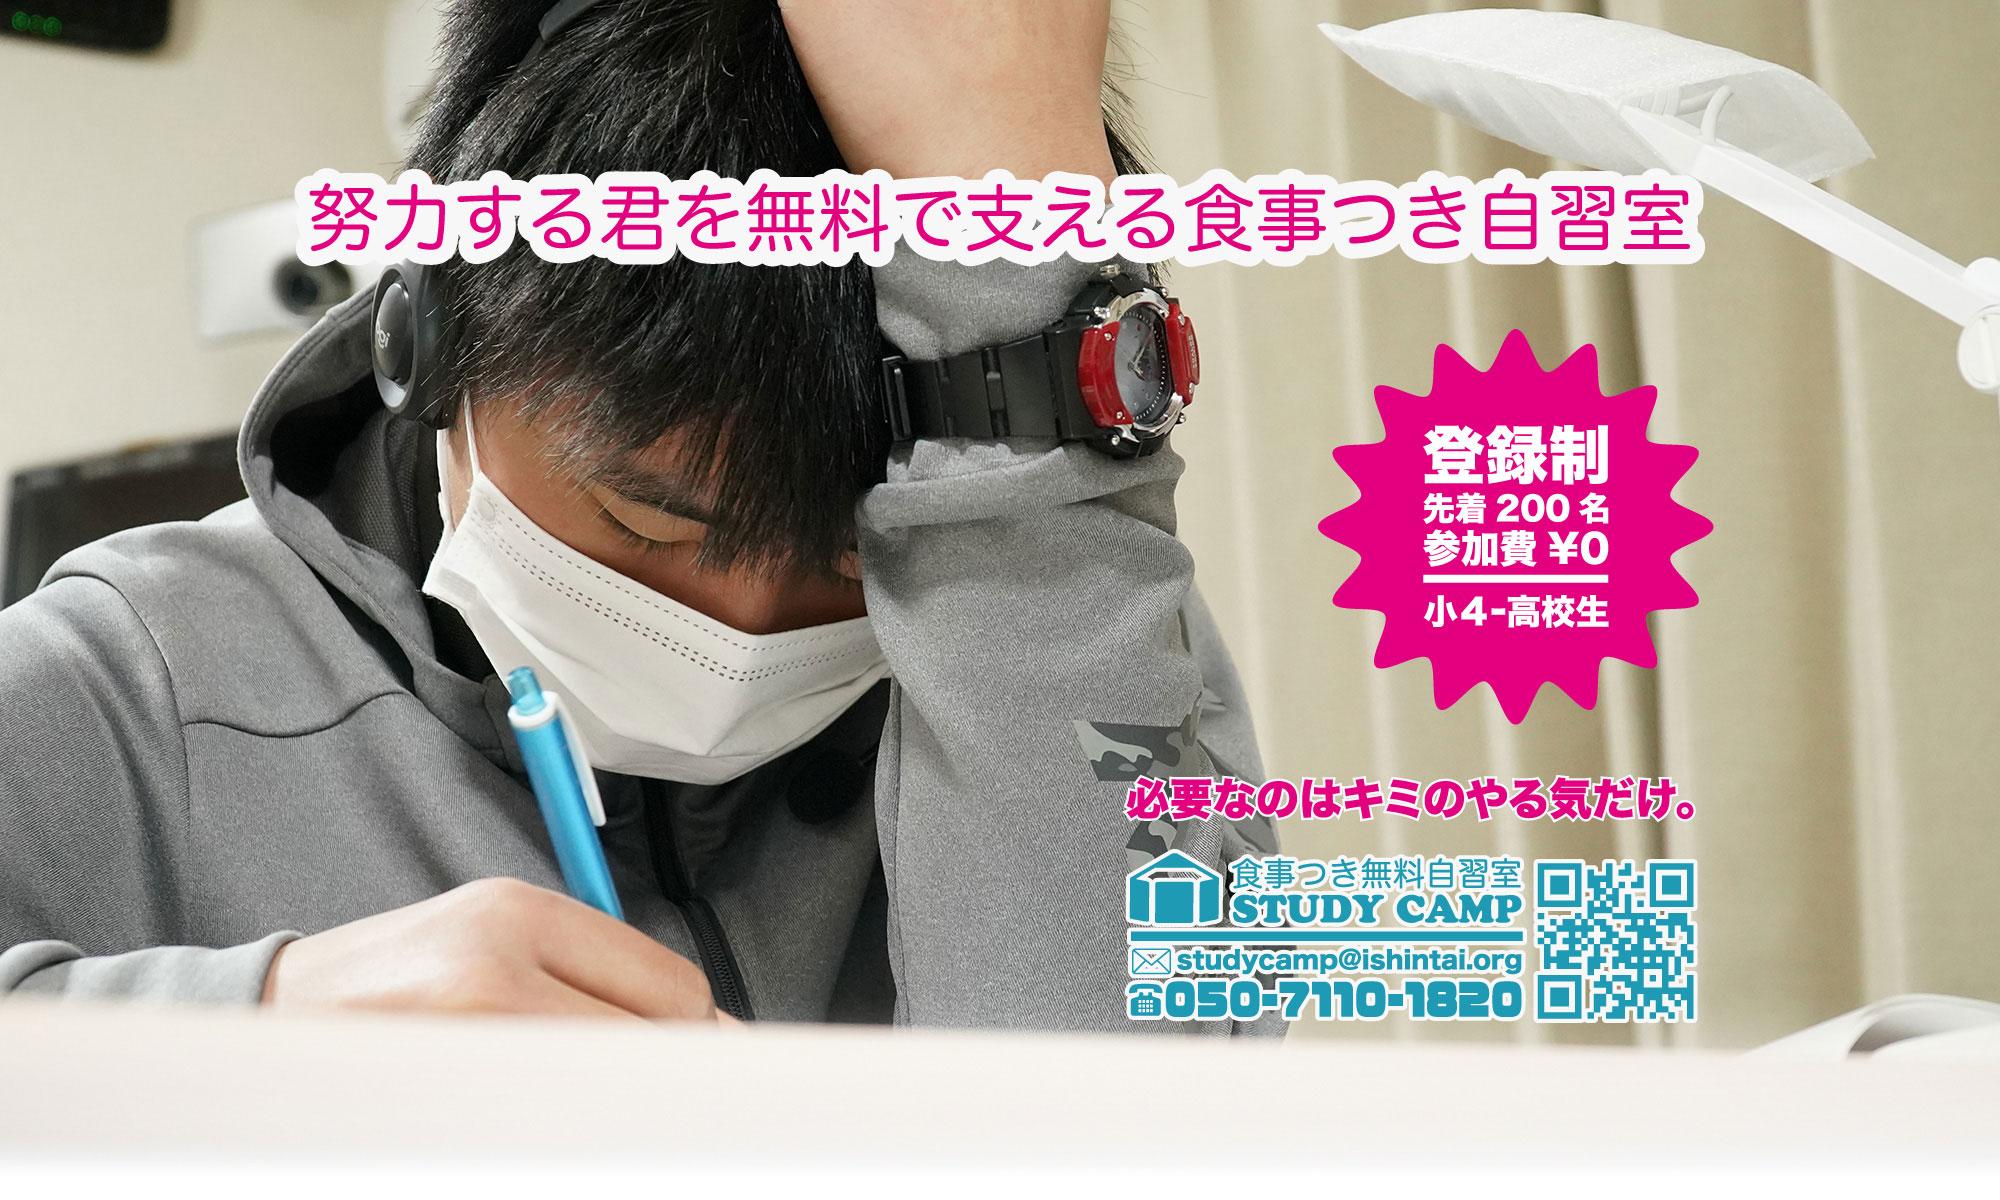 STUDY CAMP